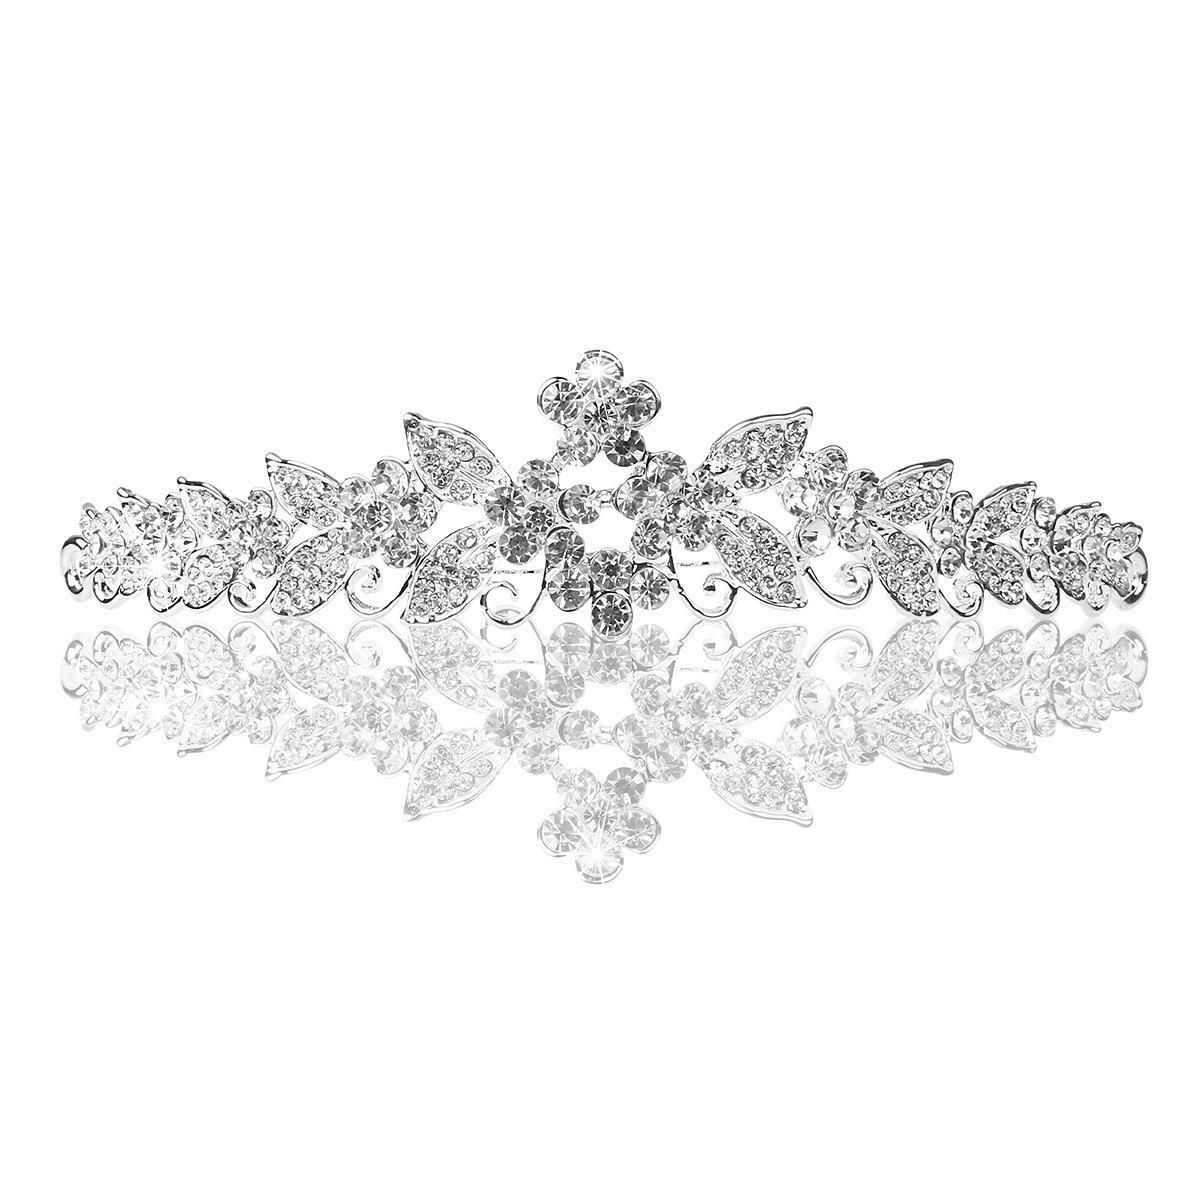 PIXNOR Crystal Rhinestones Crown Tiara Headband with Comb - Great for Wedding Bridal Bridesmaid Prom (Silver) (Silver)